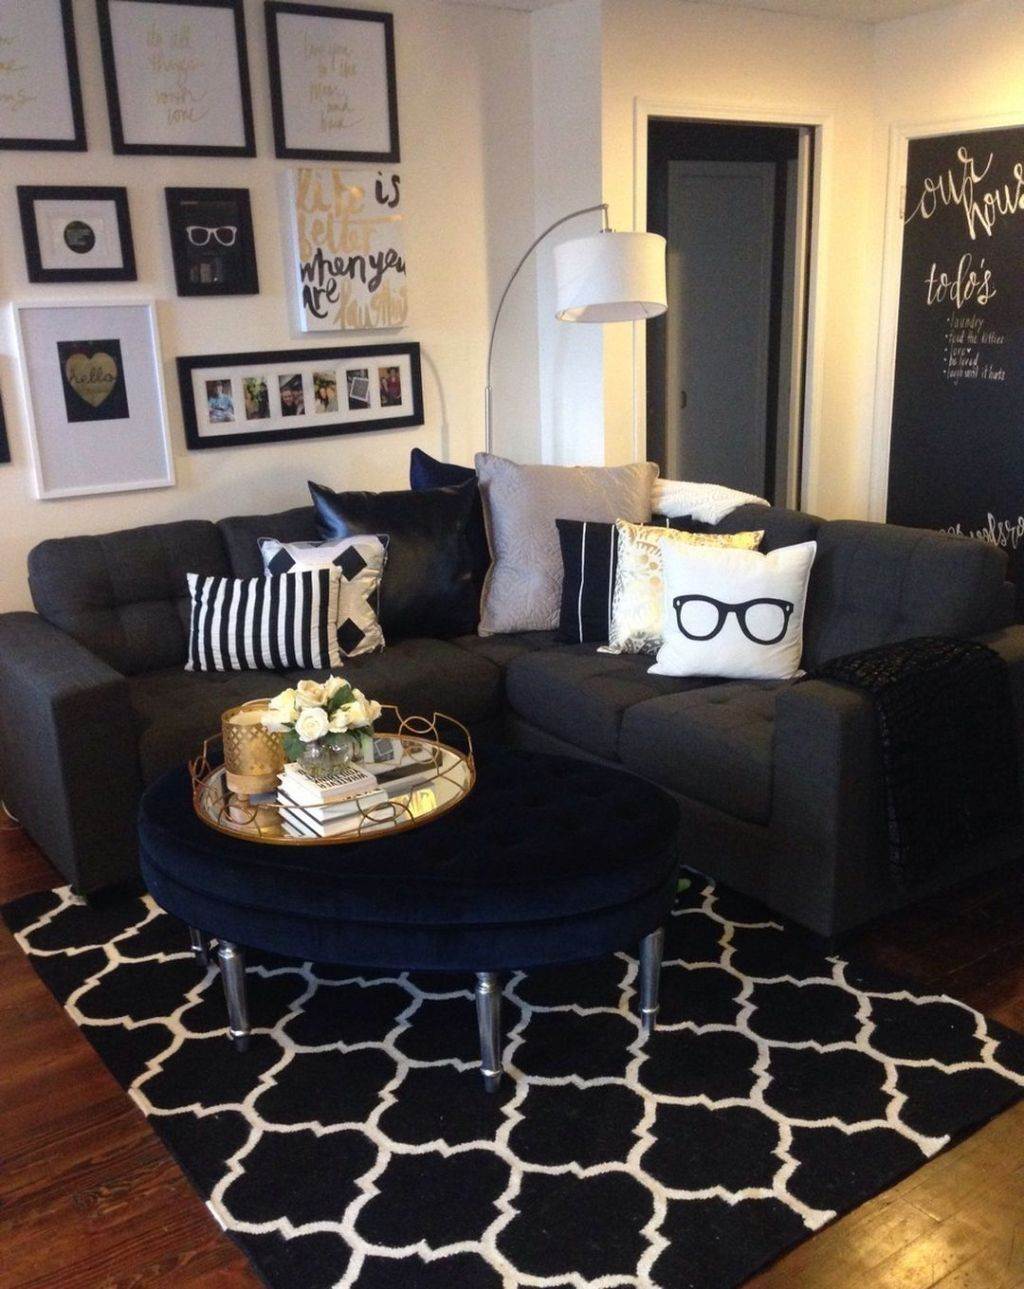 41 Wonderful DIY Apartment On a Budget | Pinterest